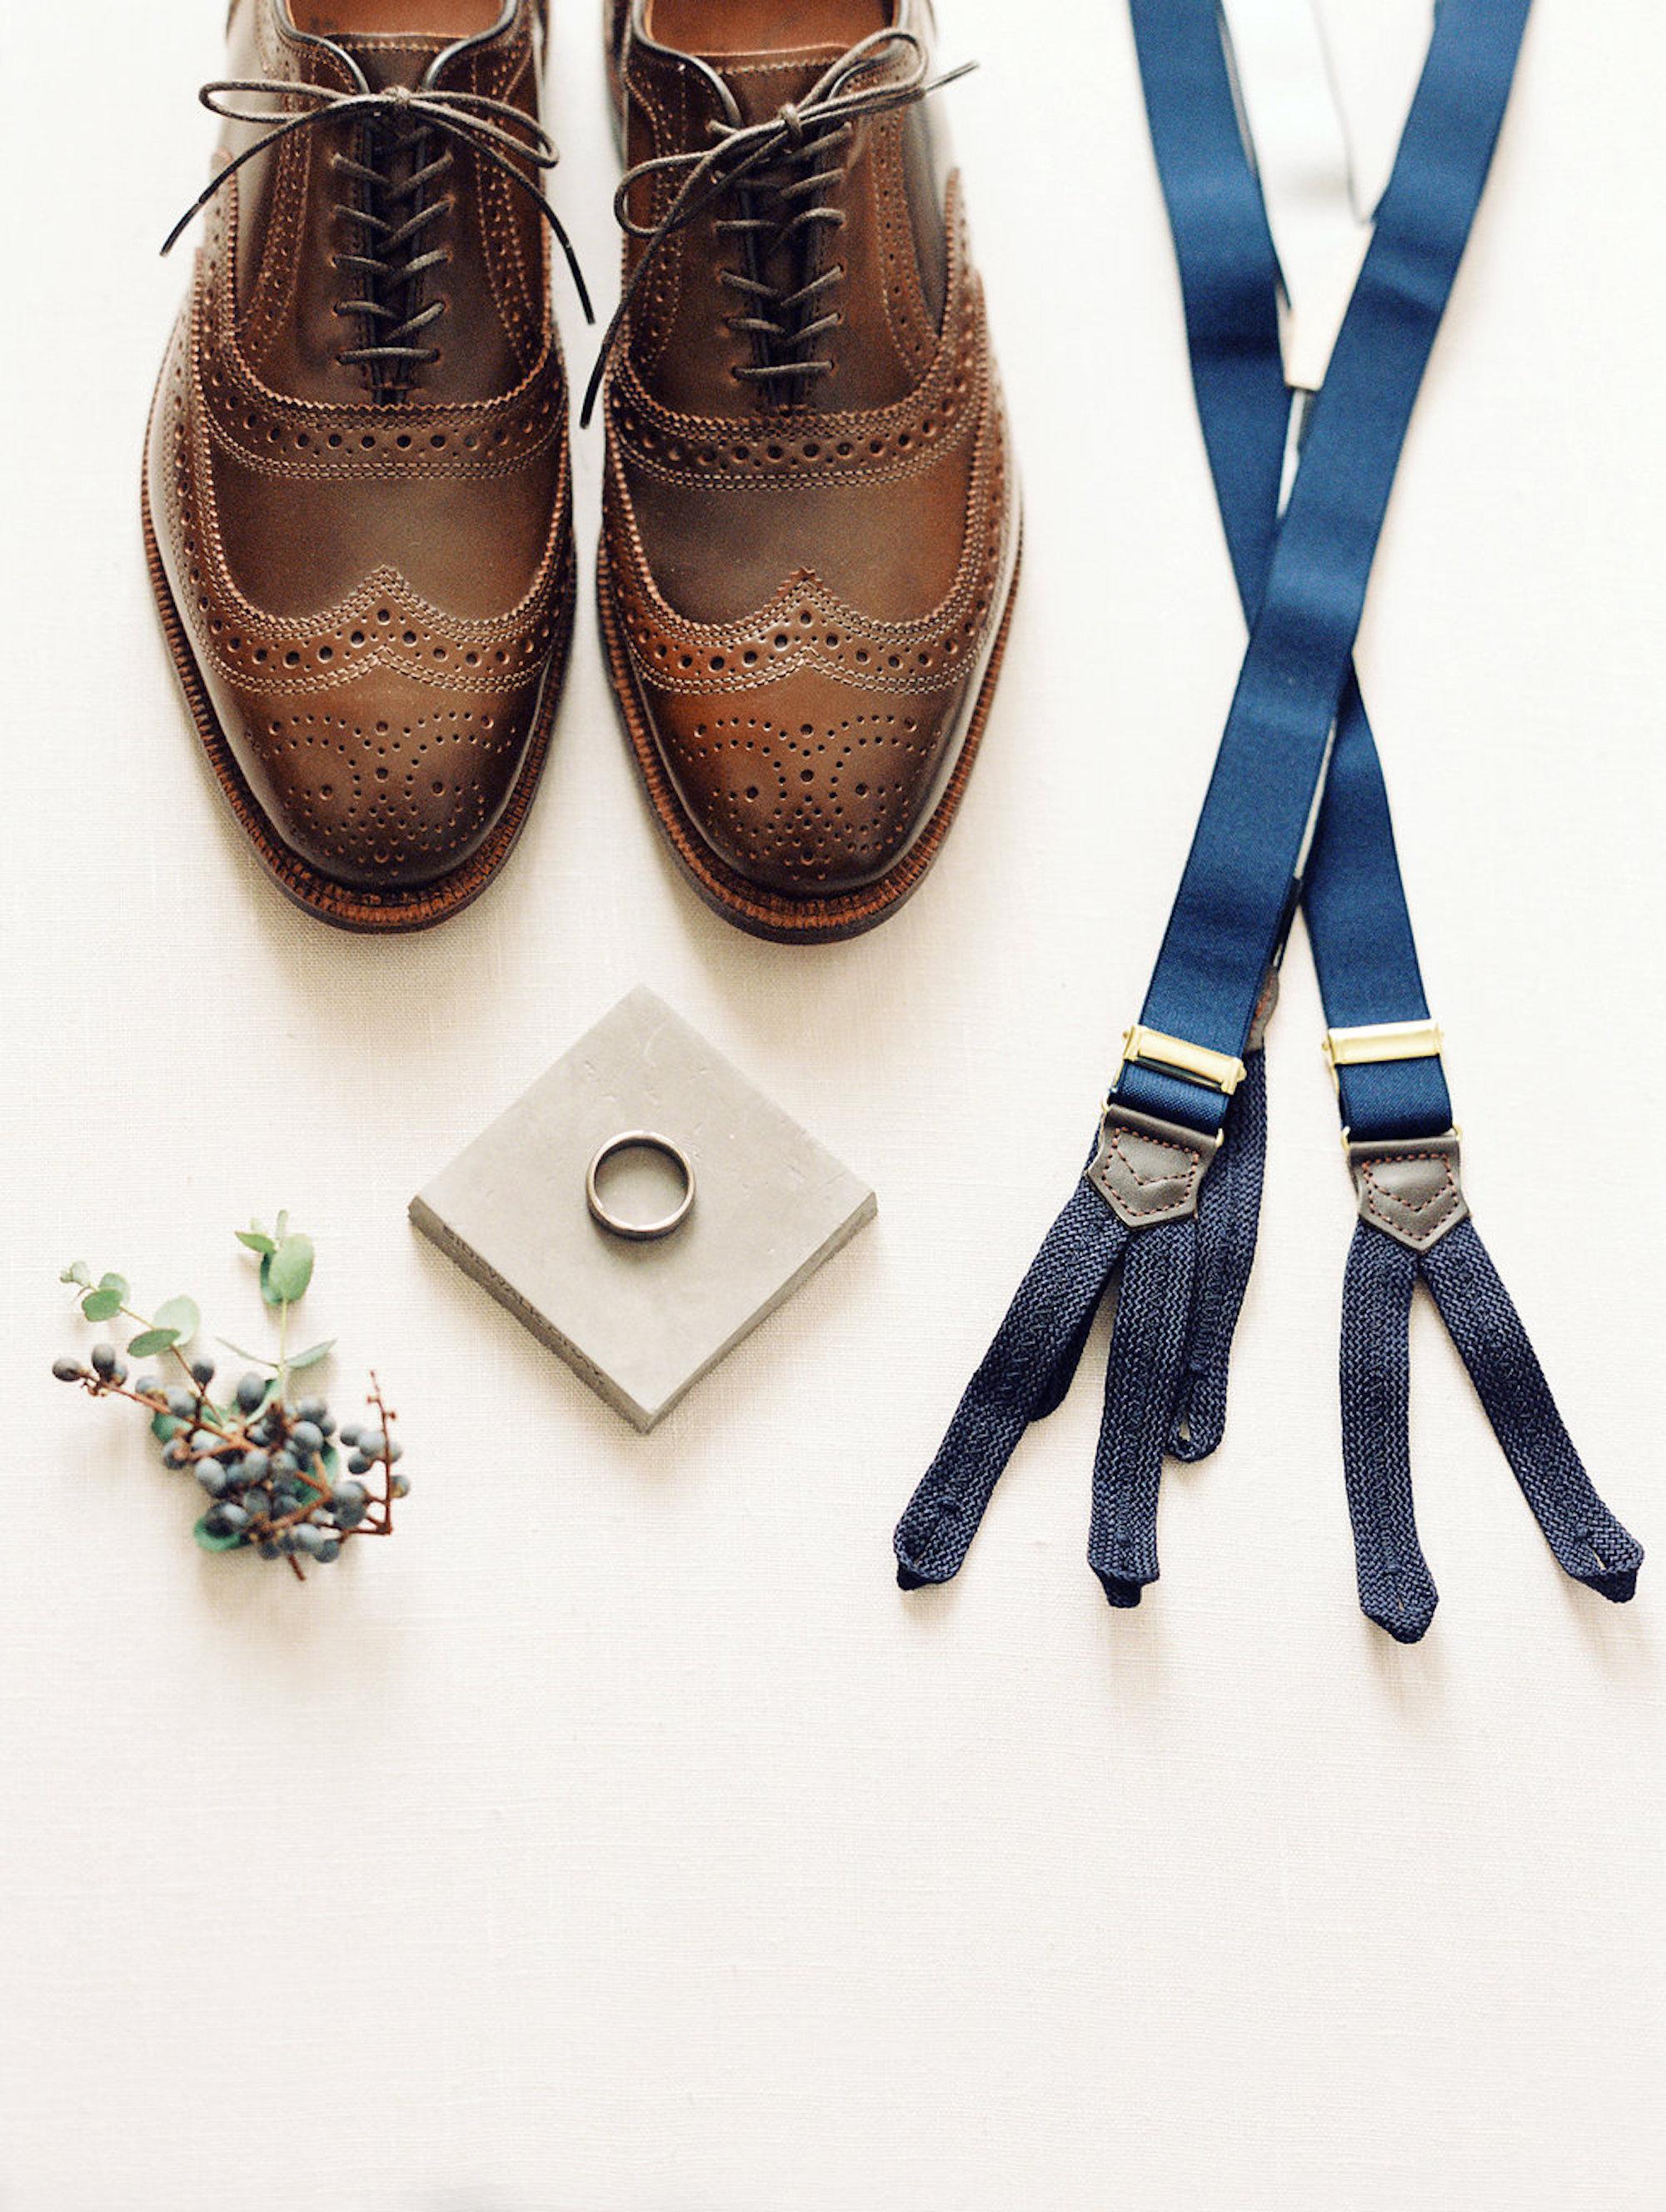 www.santabarbarawedding.com | Lavender & Twine | Michele B. Events | Santa Barbara Courthouse | Groom's Accessories